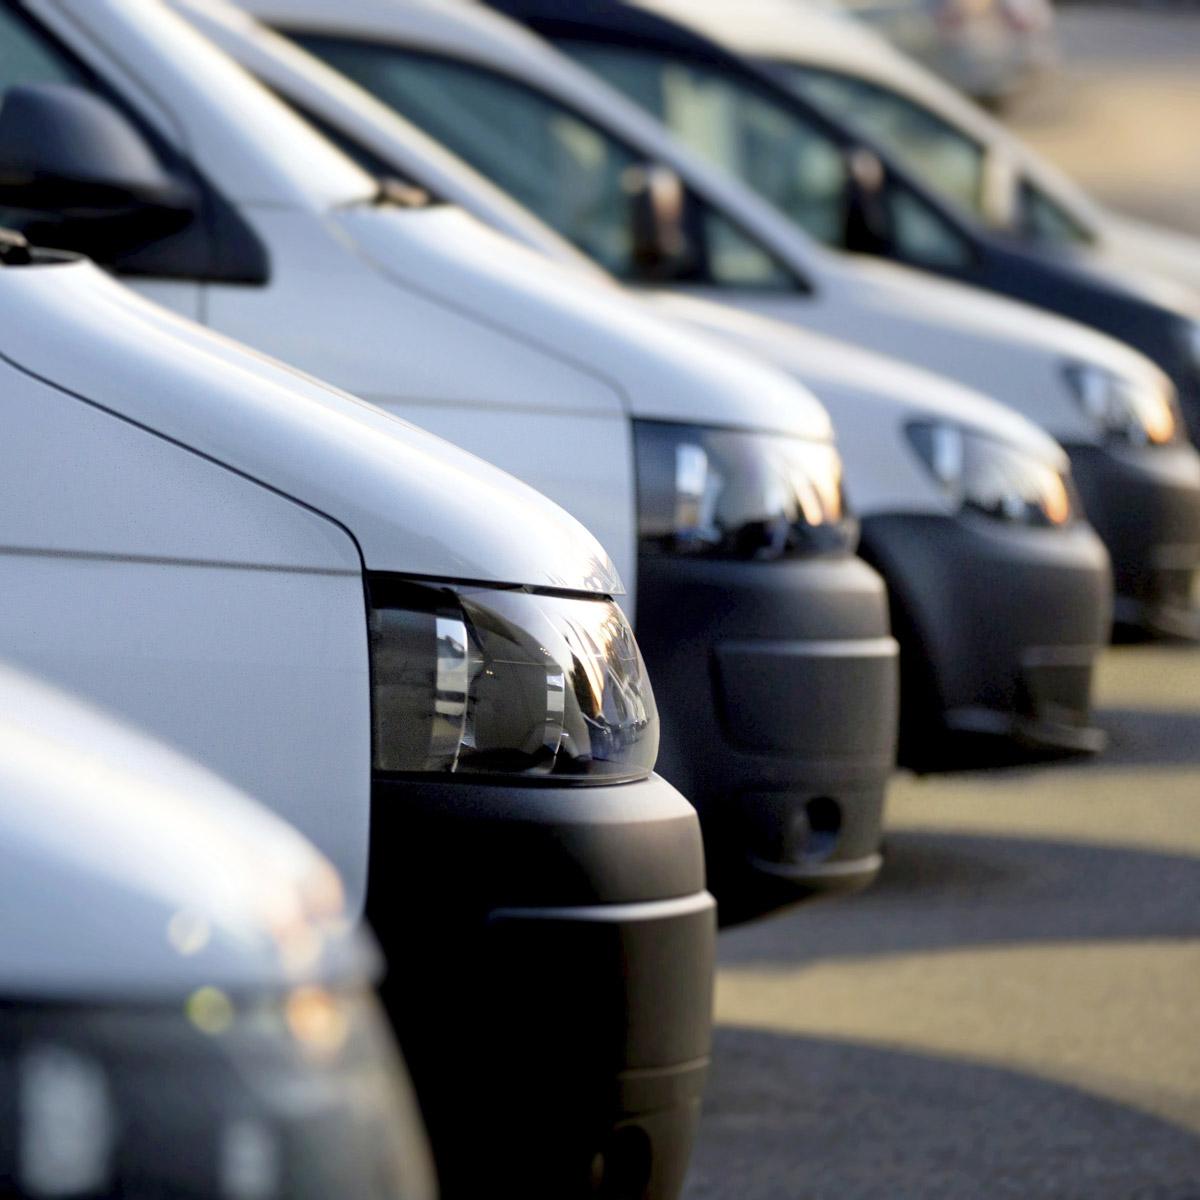 Lloyds small fleet transport